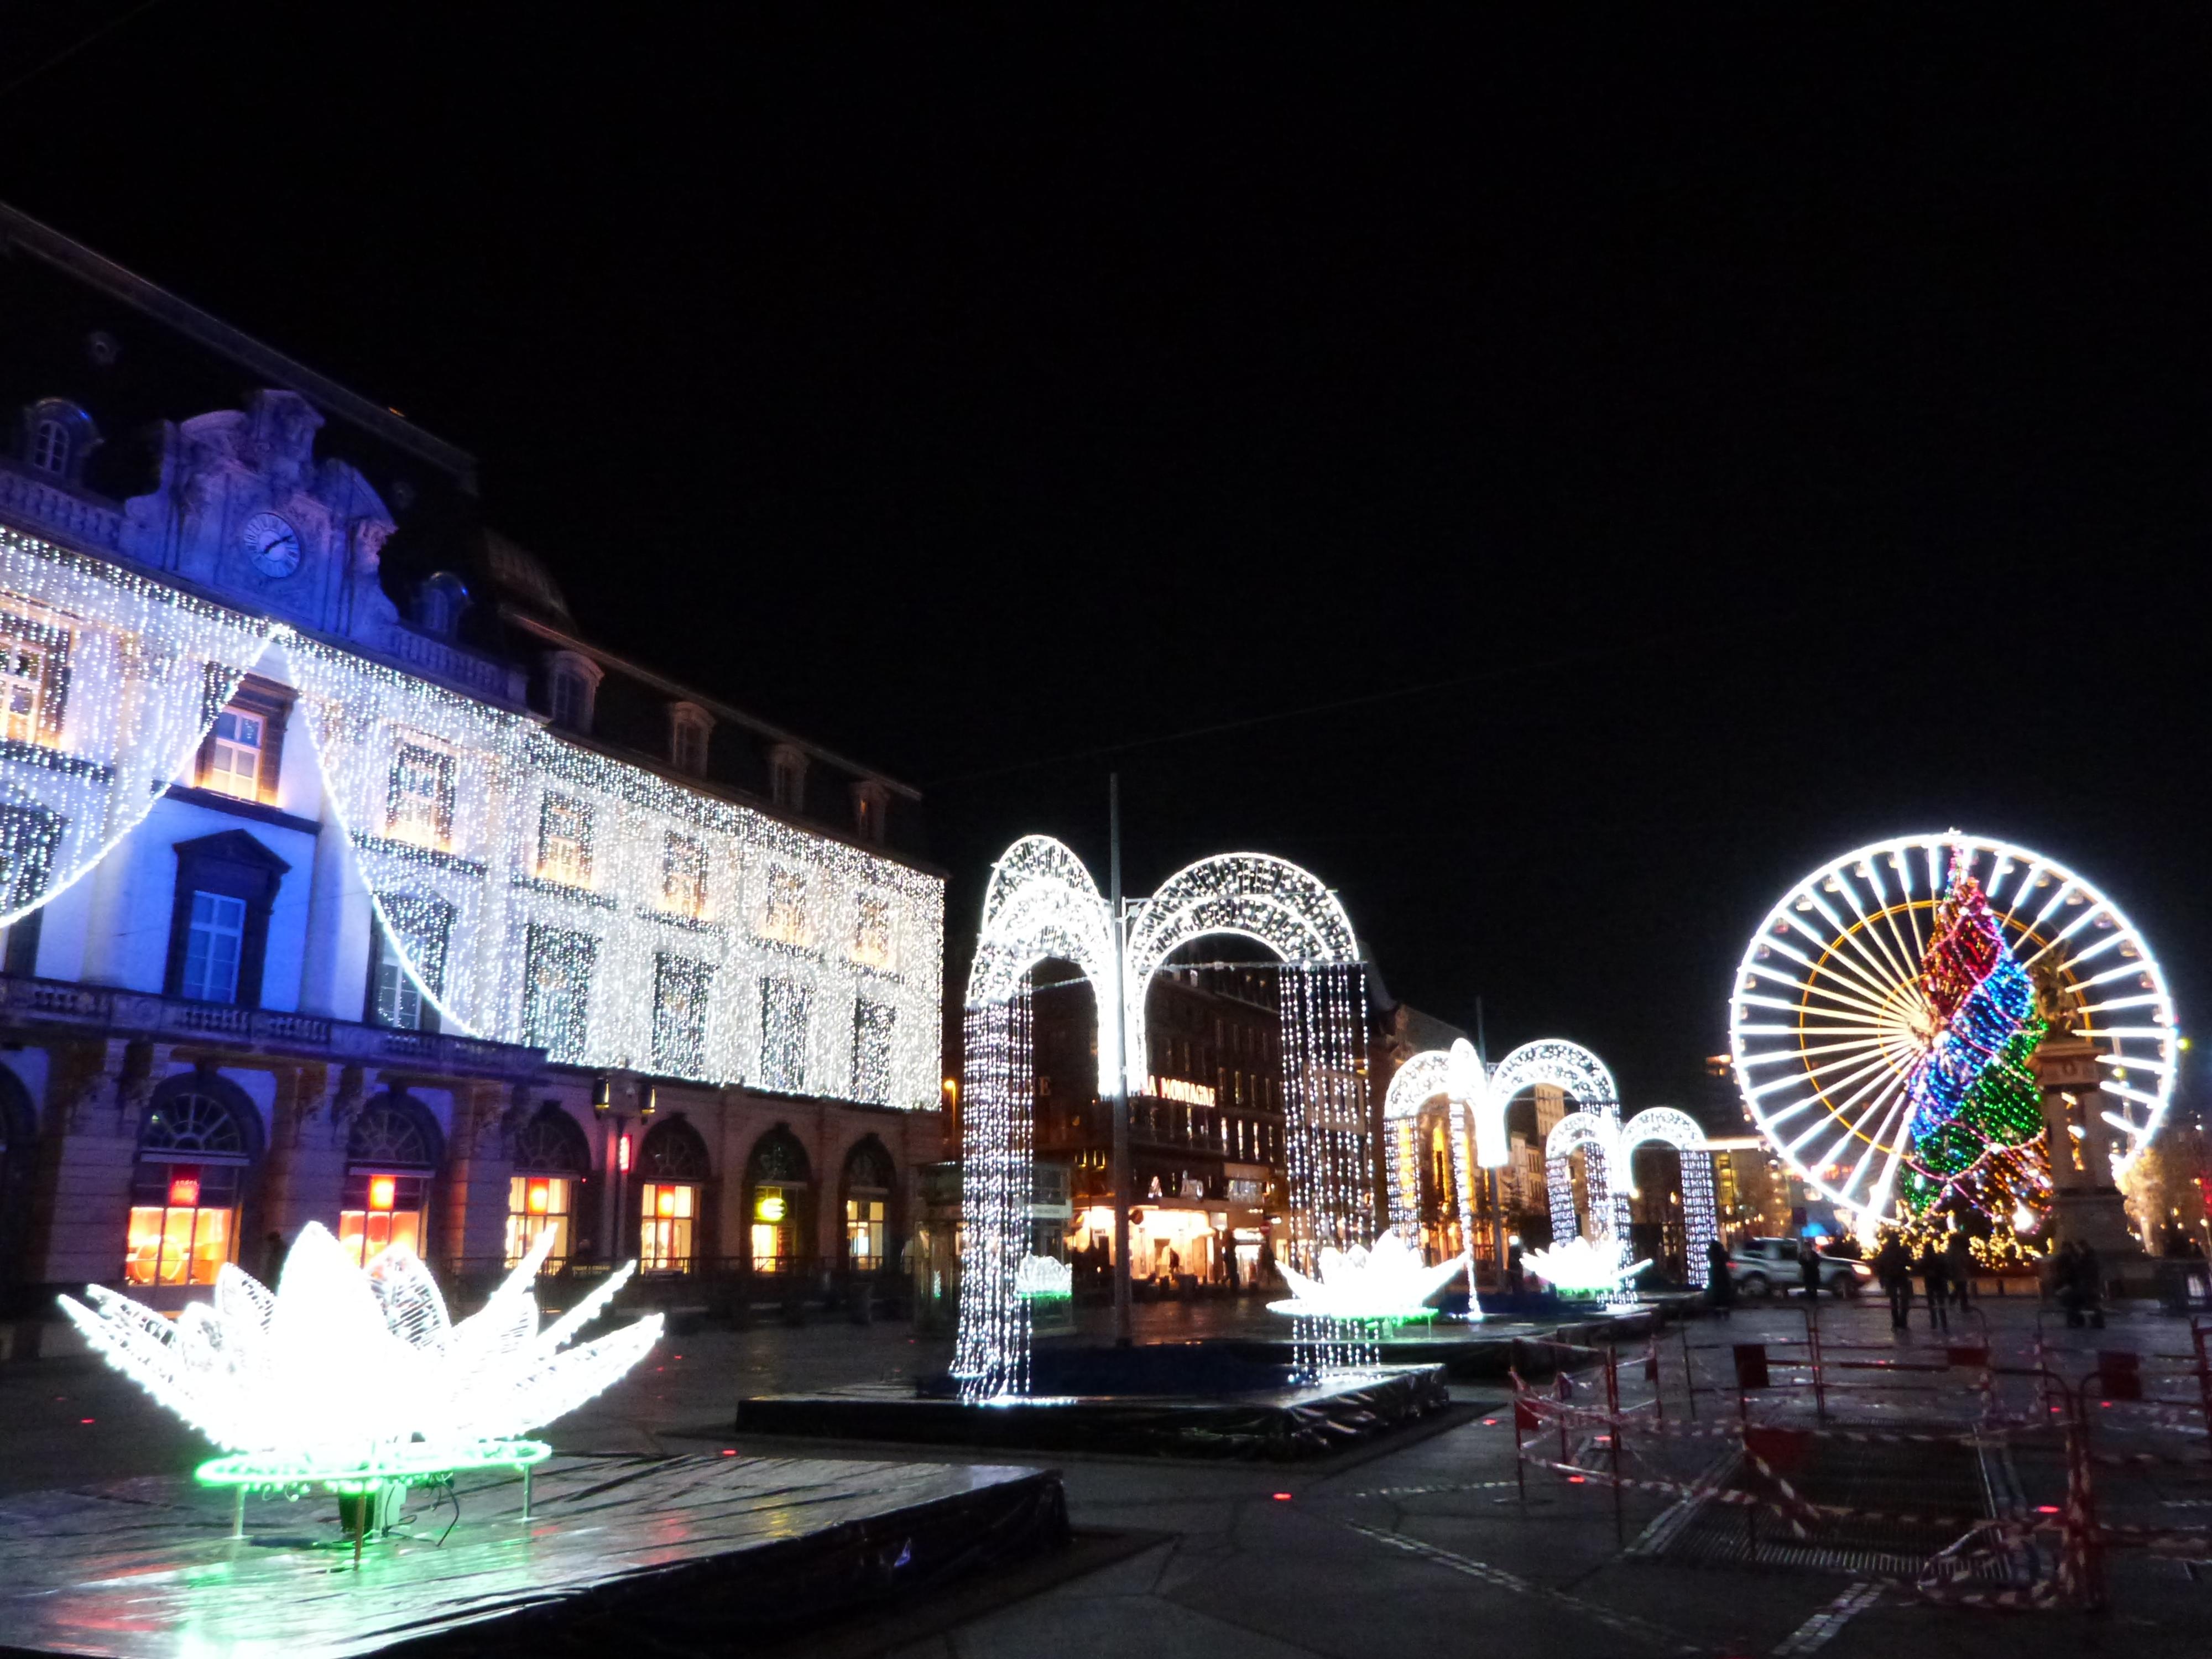 Illuminations de Noël à Clermont-Ferrand